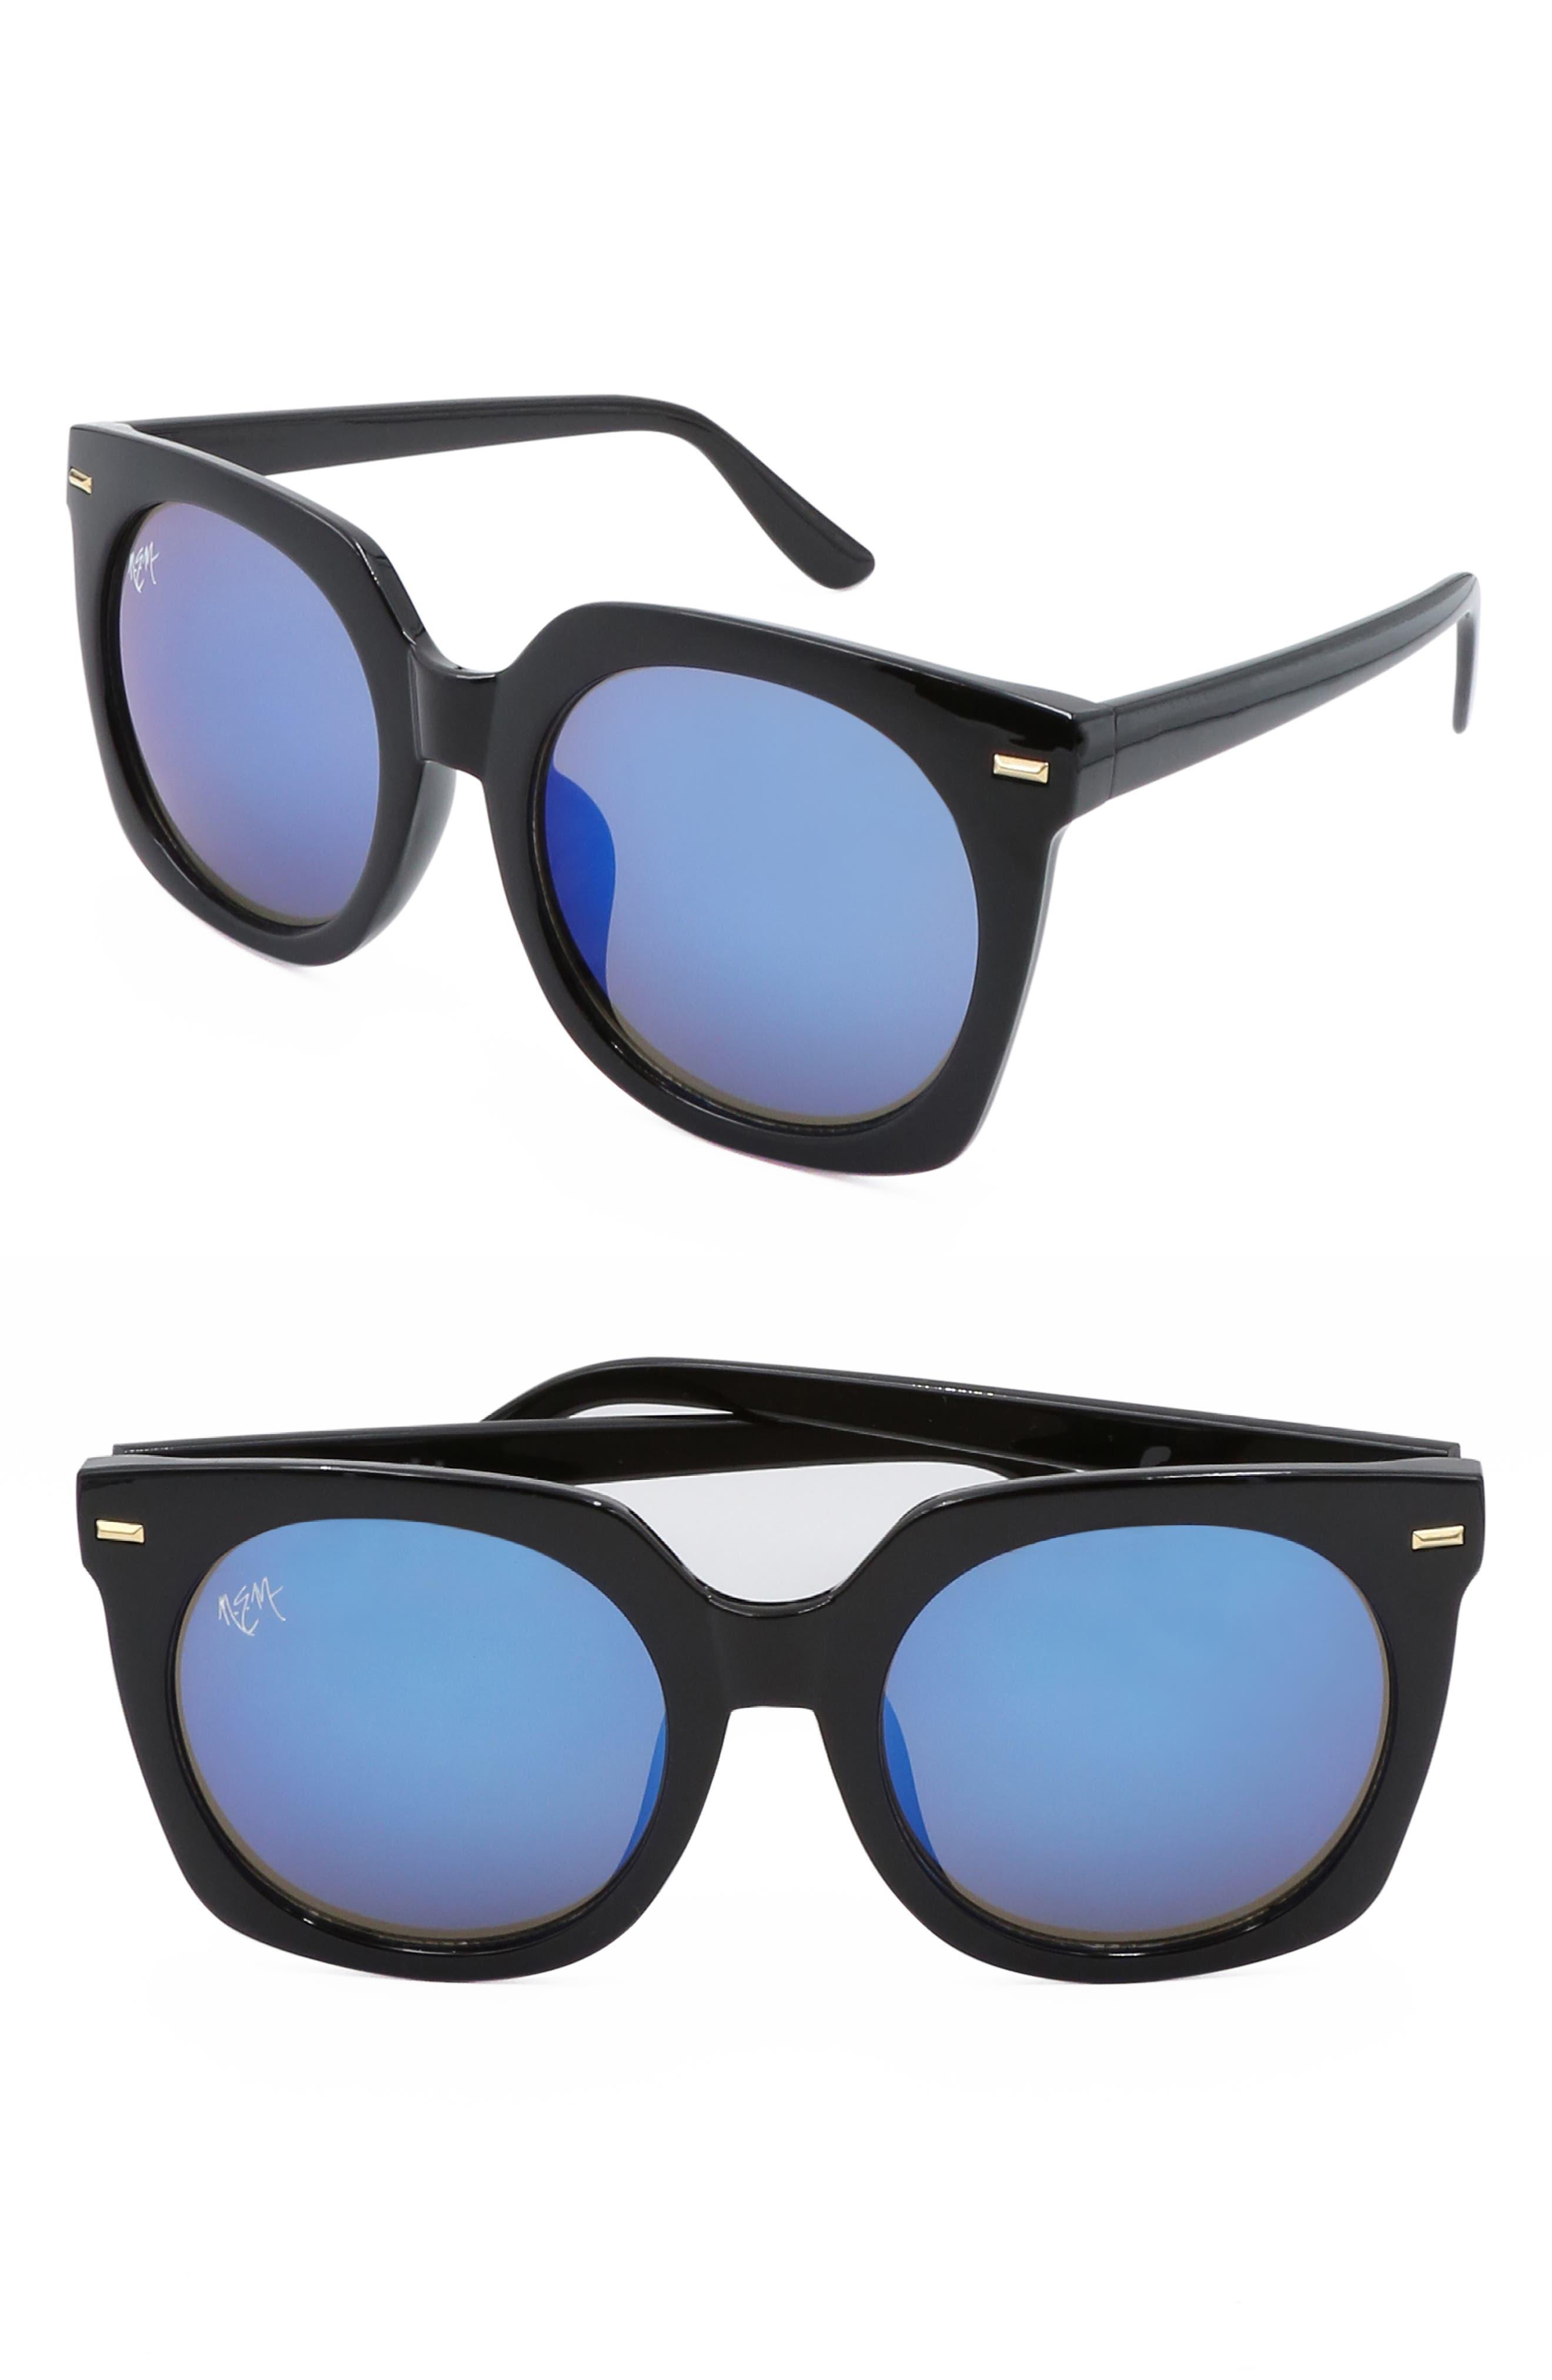 Nem Melrose 55Mm Square Sunglasses - Black W Dark Blue Mirror